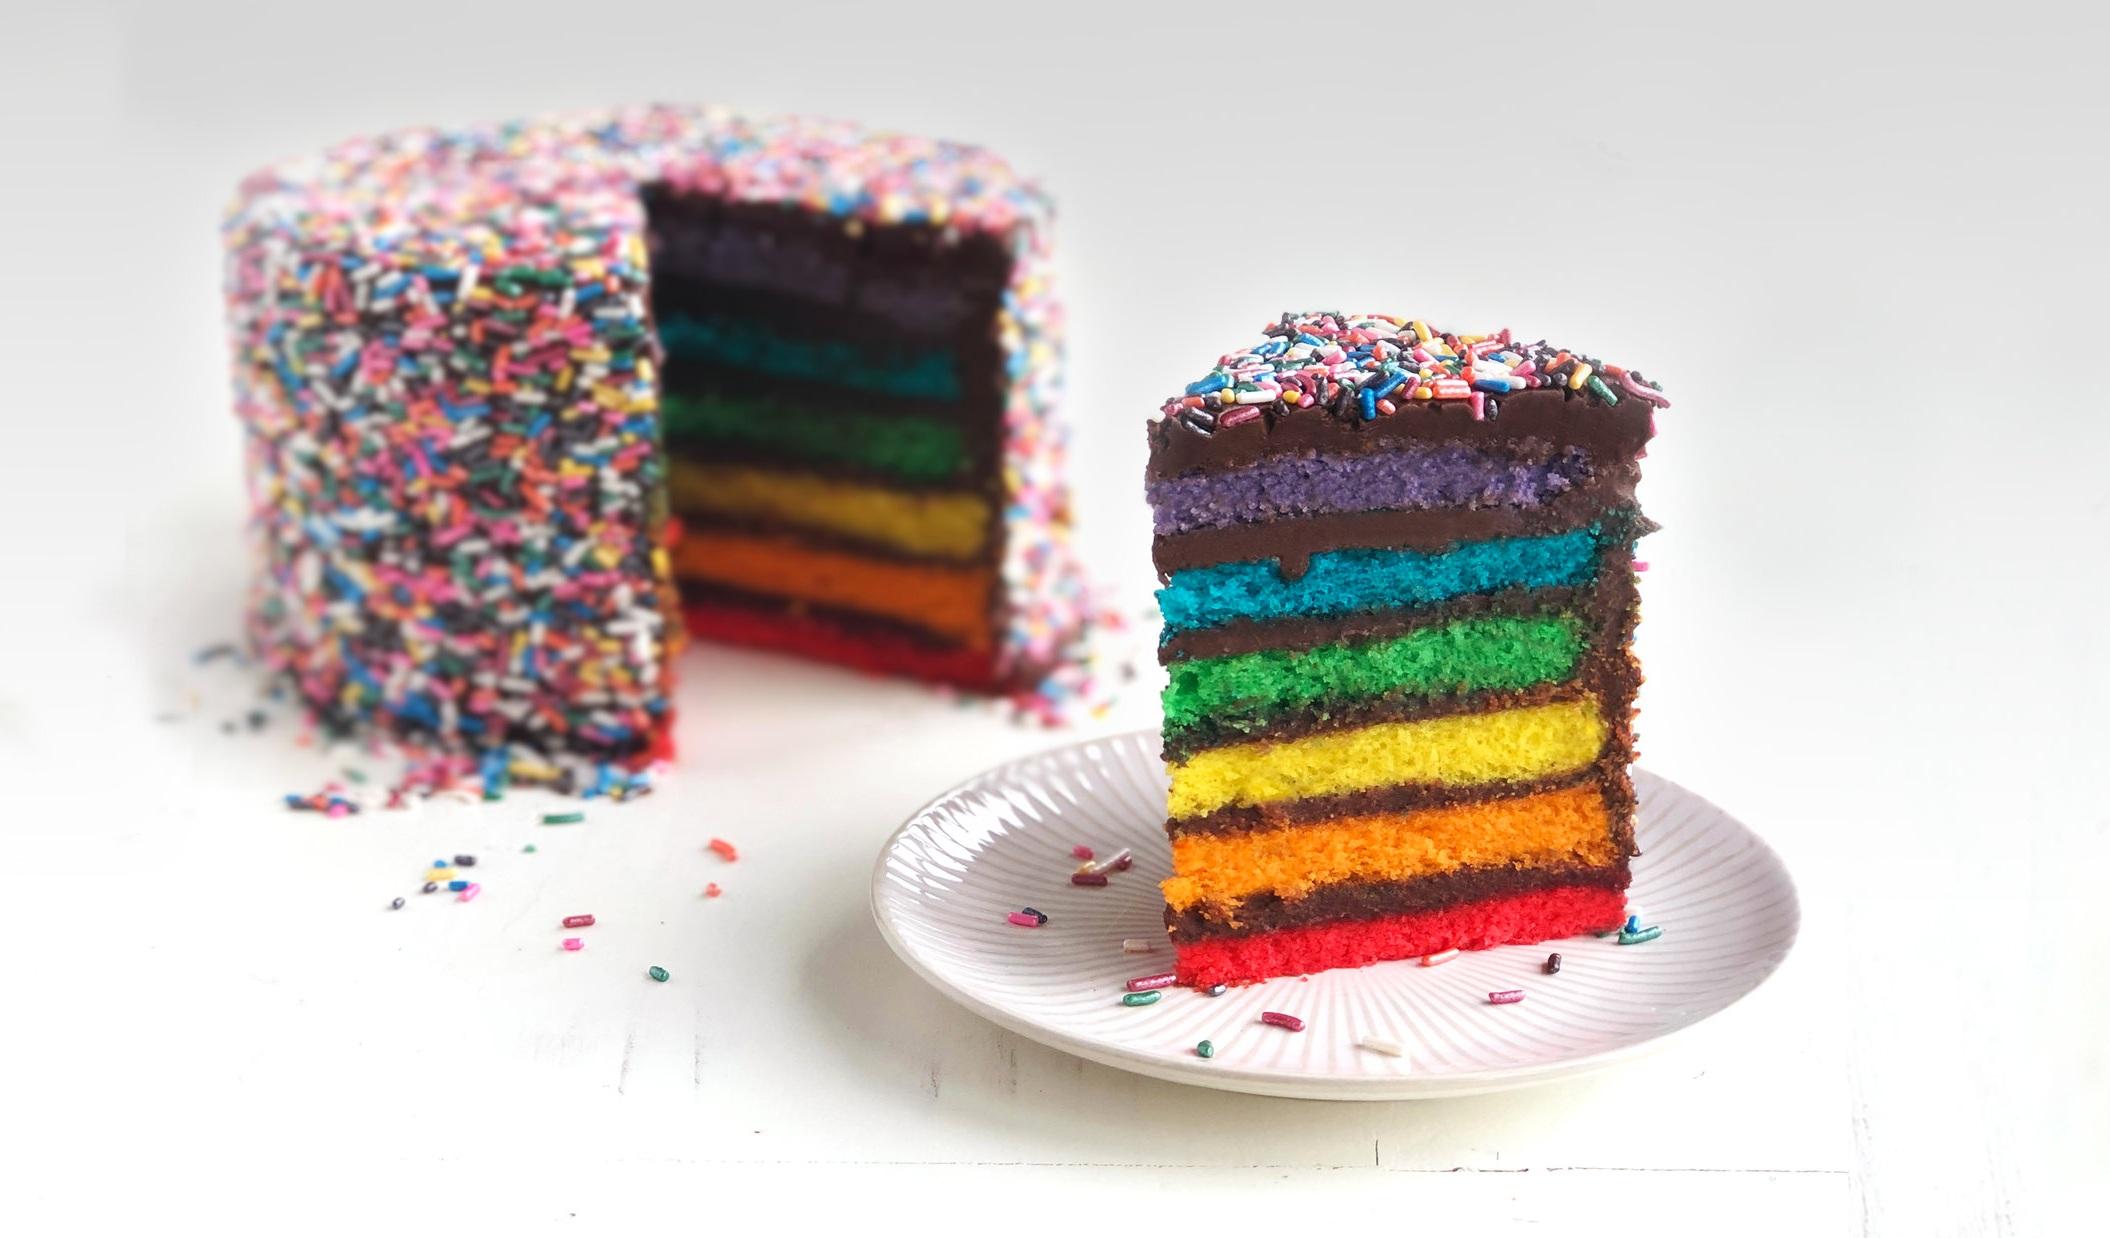 Carlos Bakery Header Image V2